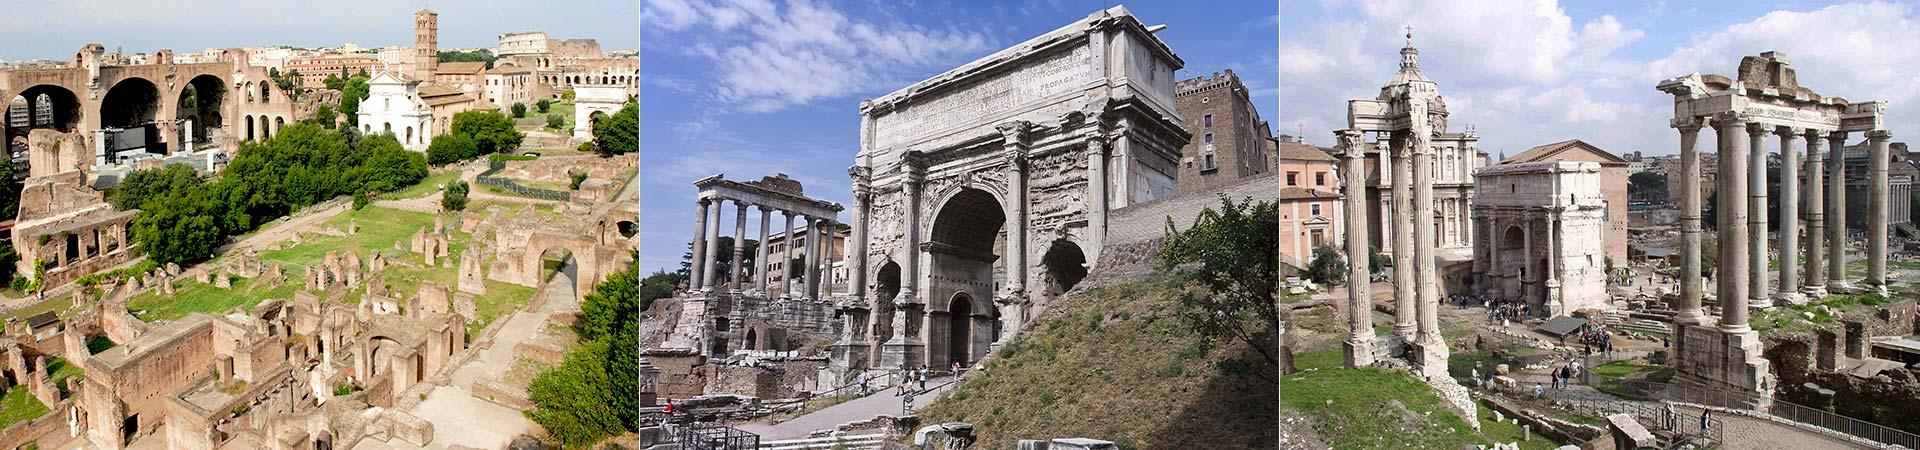 coliseum roman forum